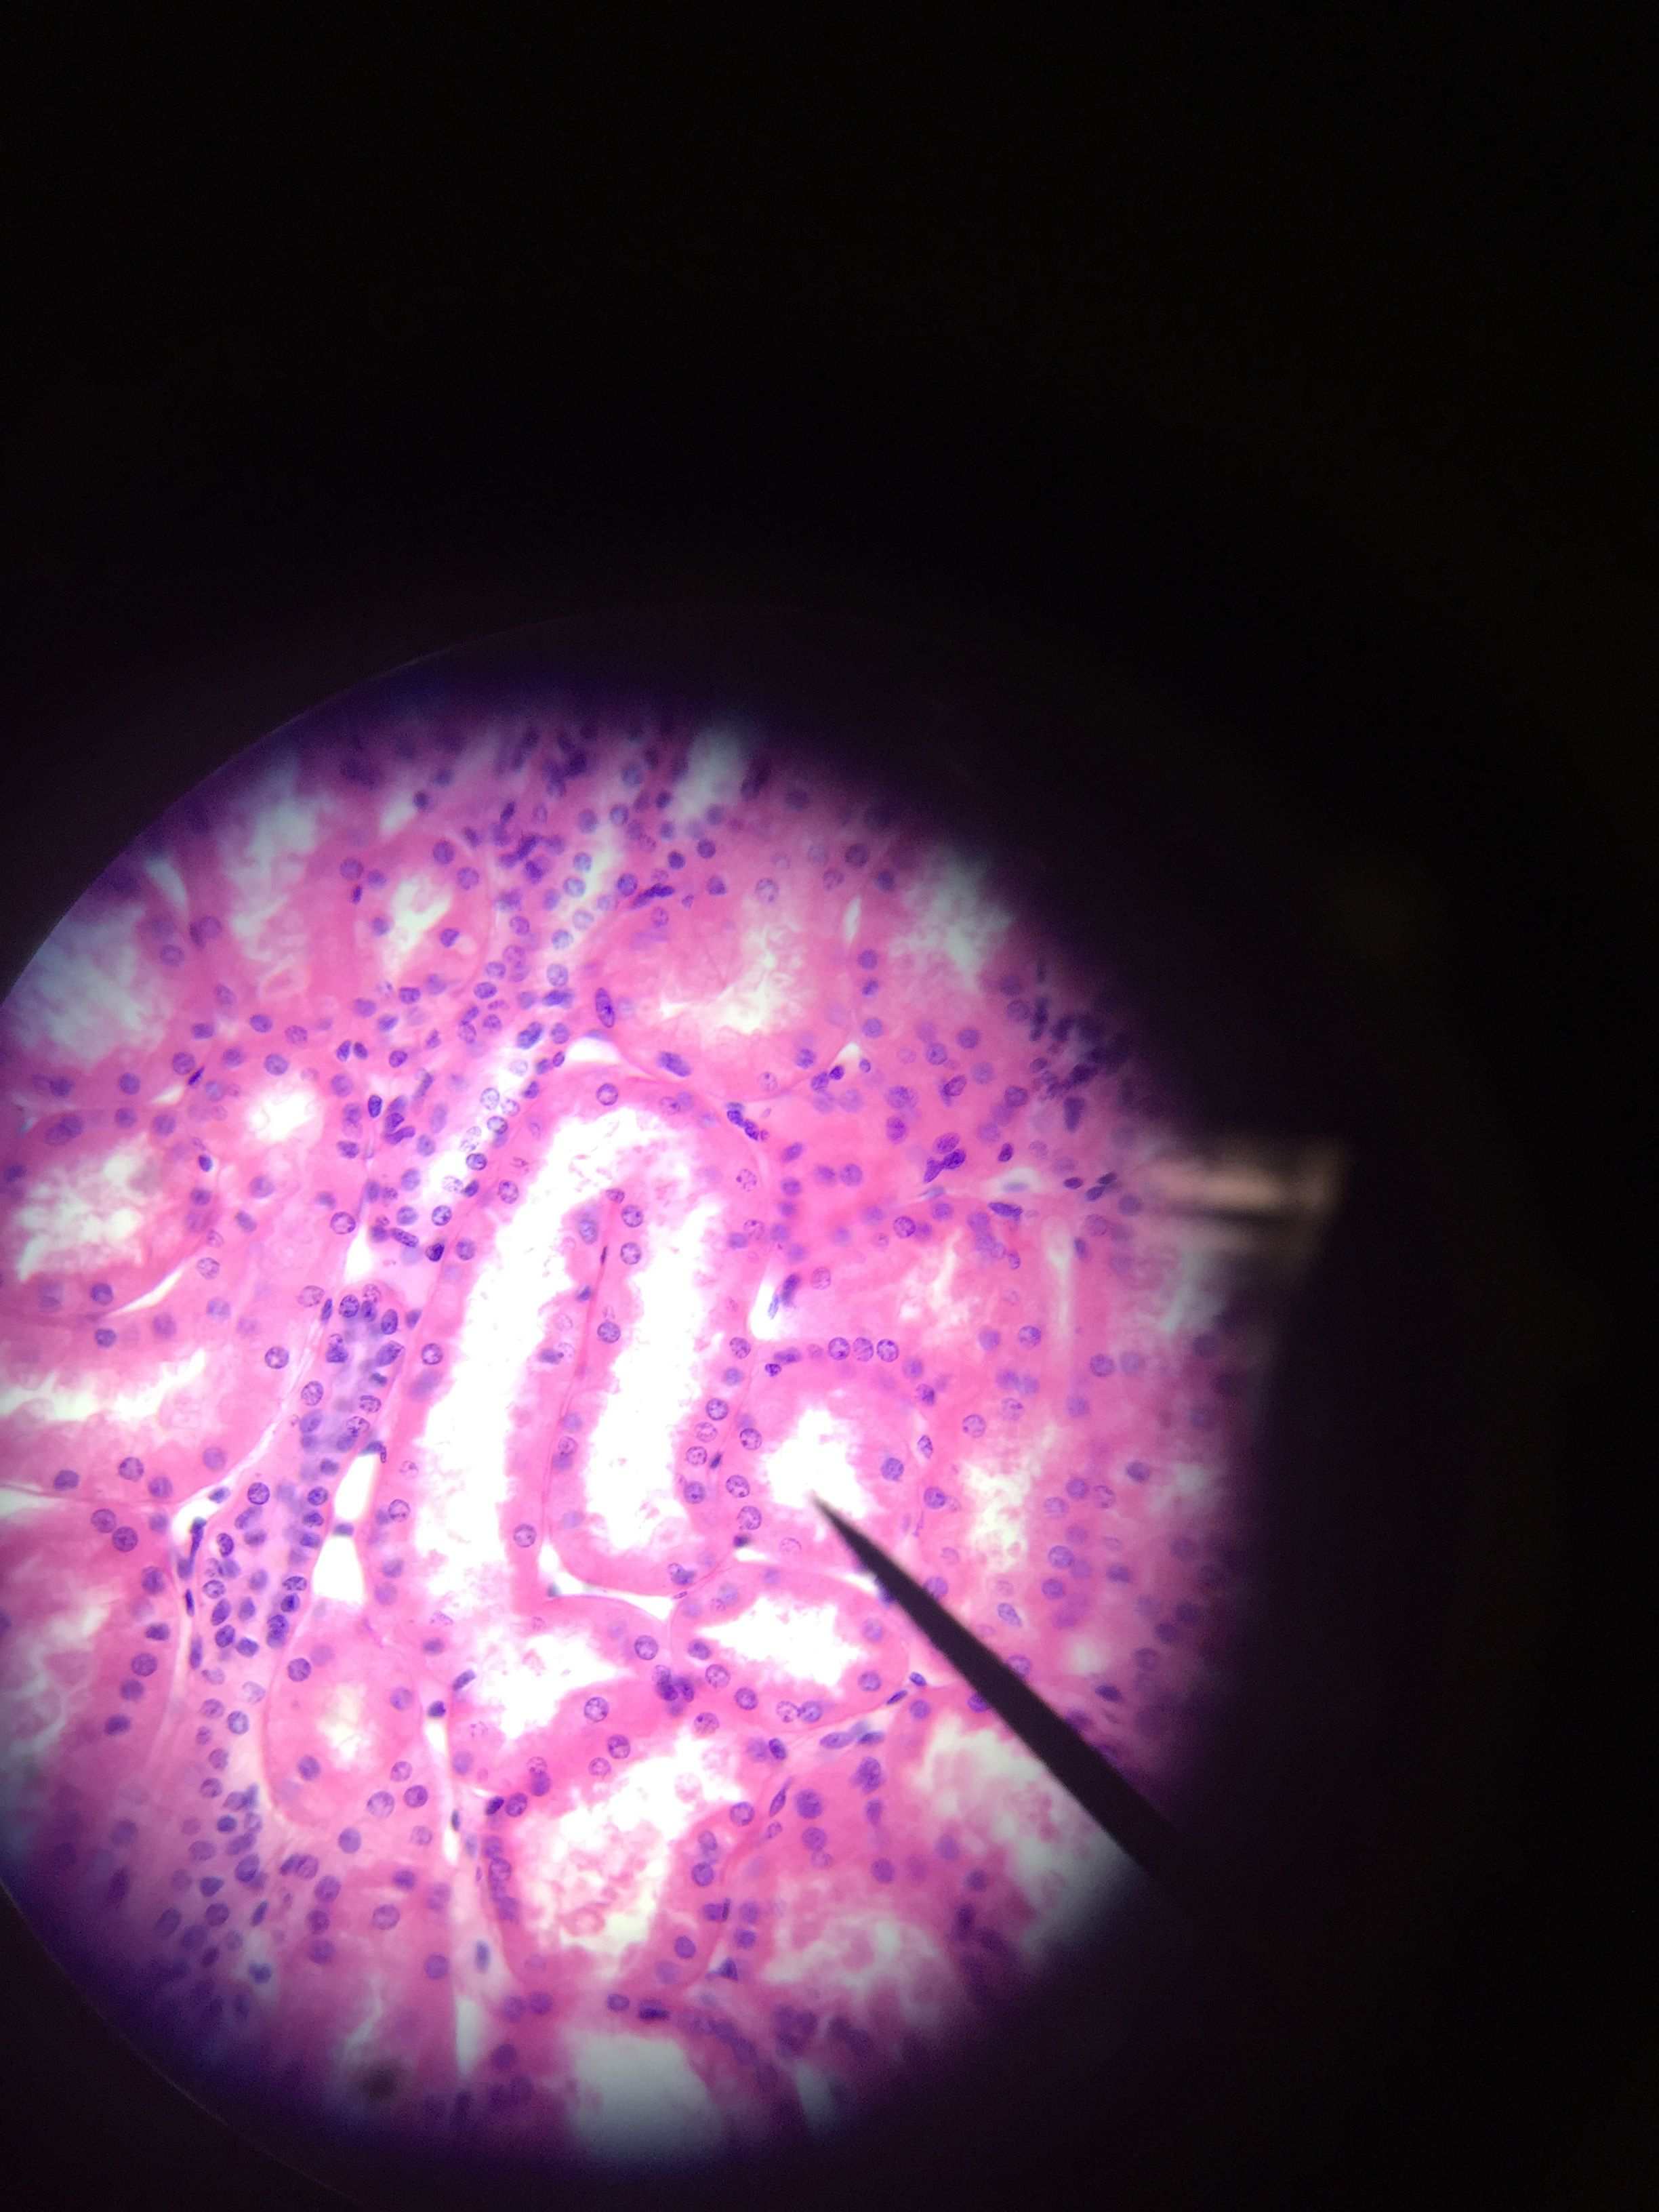 PCT - pointer on microvilli